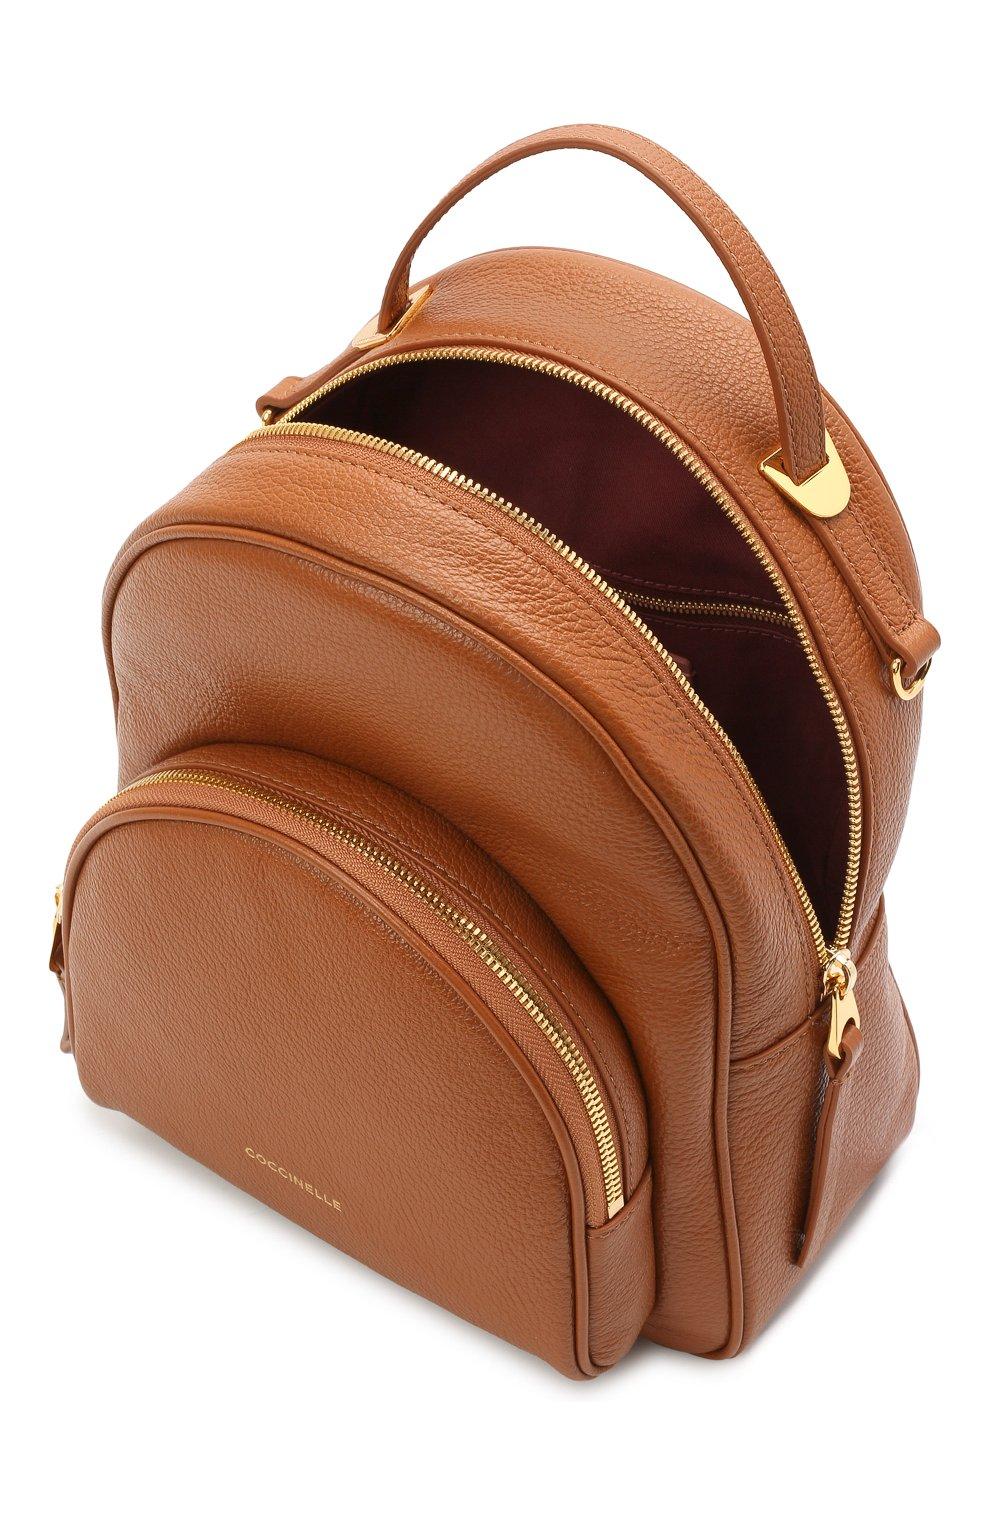 Женский рюкзак lea COCCINELLE коричневого цвета, арт. E1 H60 14 01 01 | Фото 4